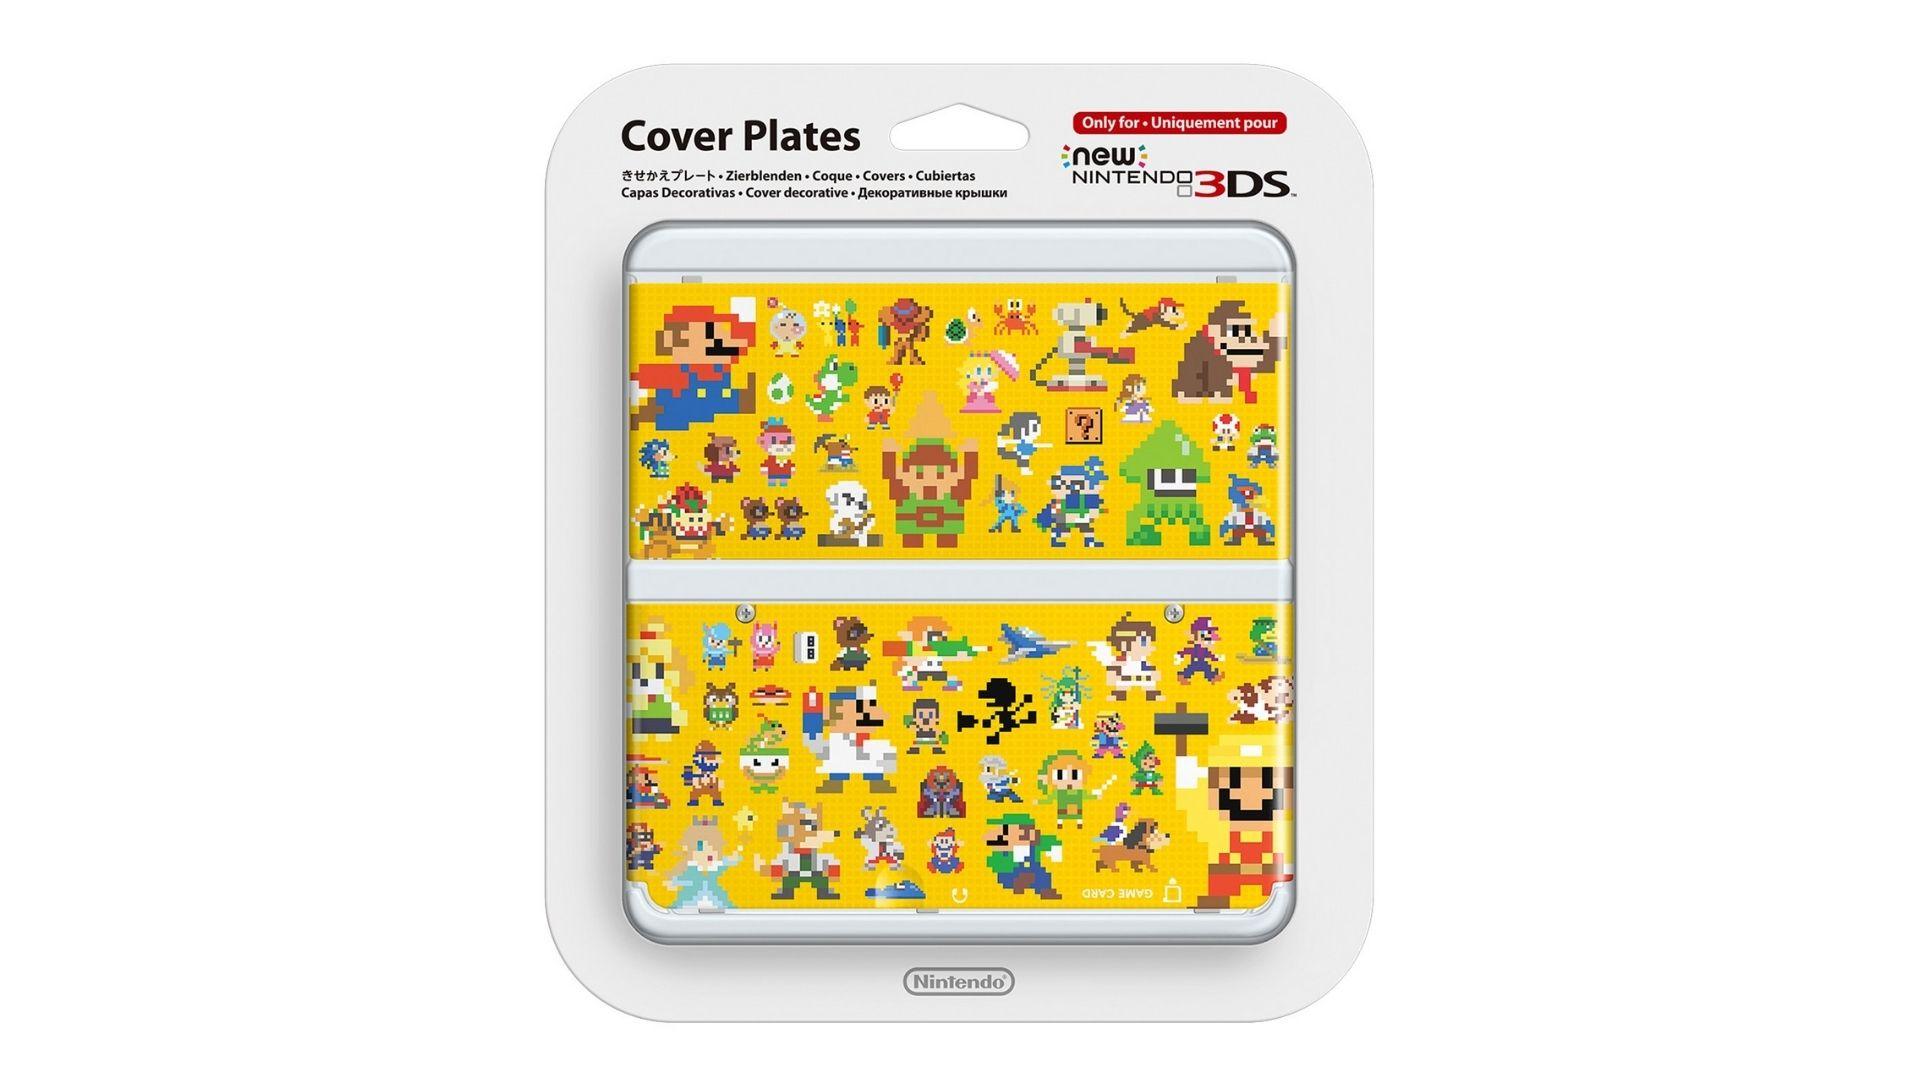 New Nintendo 3ds Cover Plate super mario maker